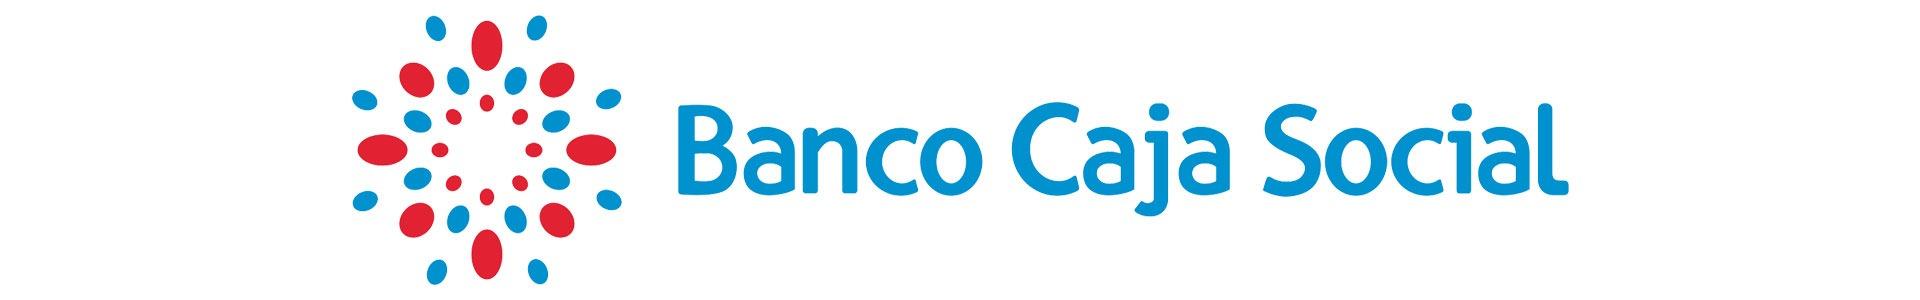 Banco-Caja-Social